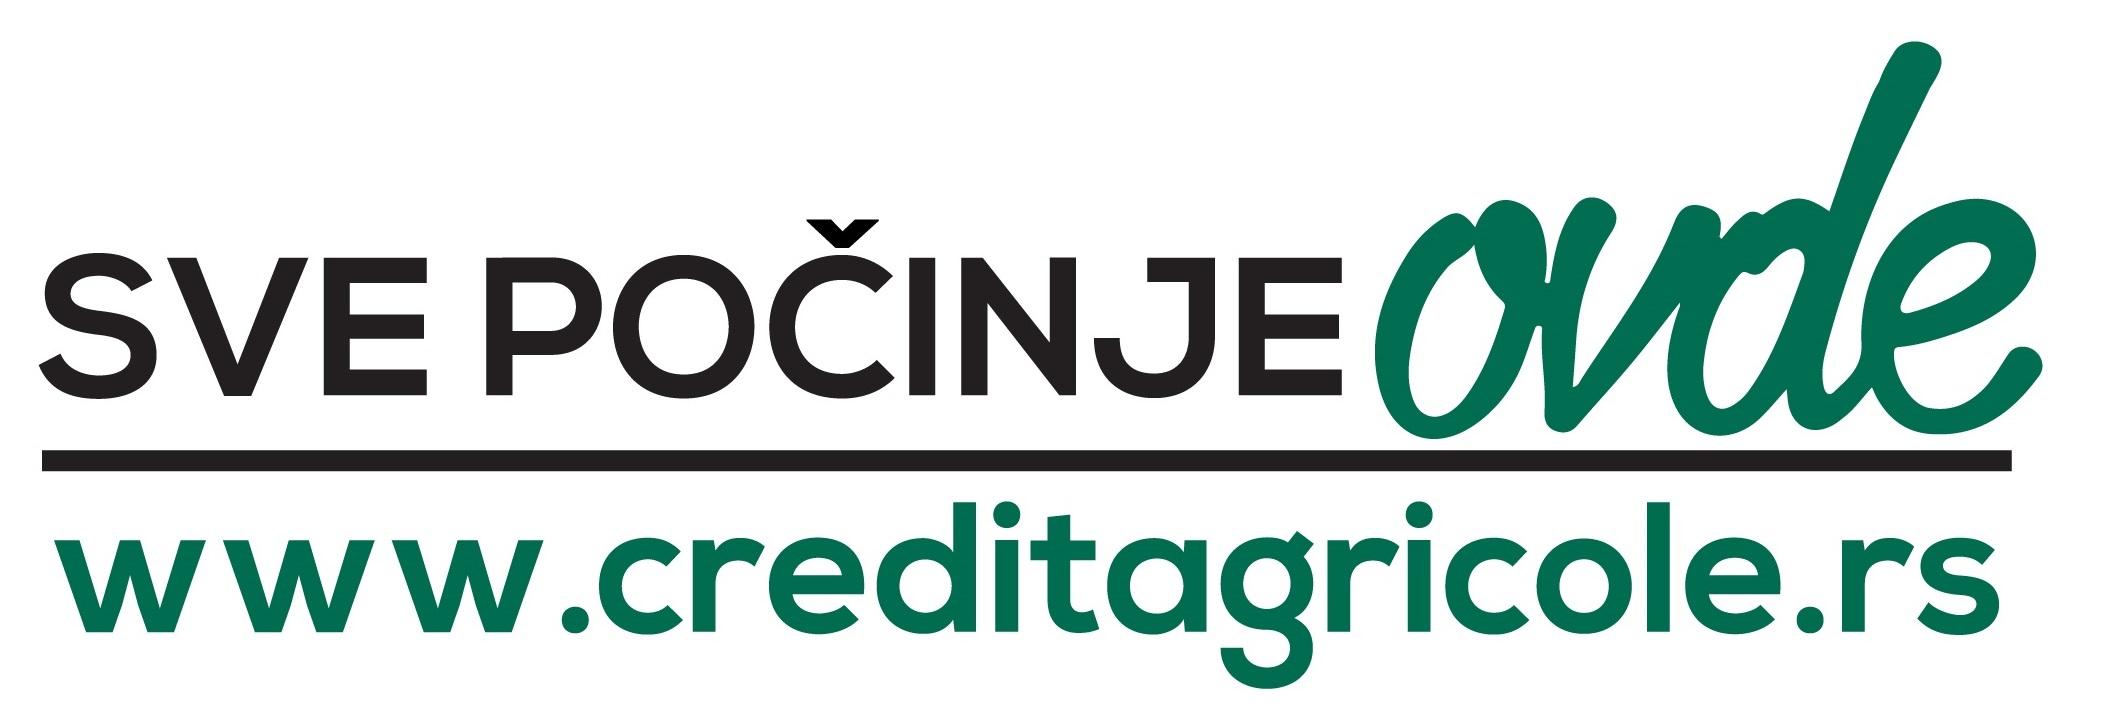 Karijera u Credit Agricole Banci-logo